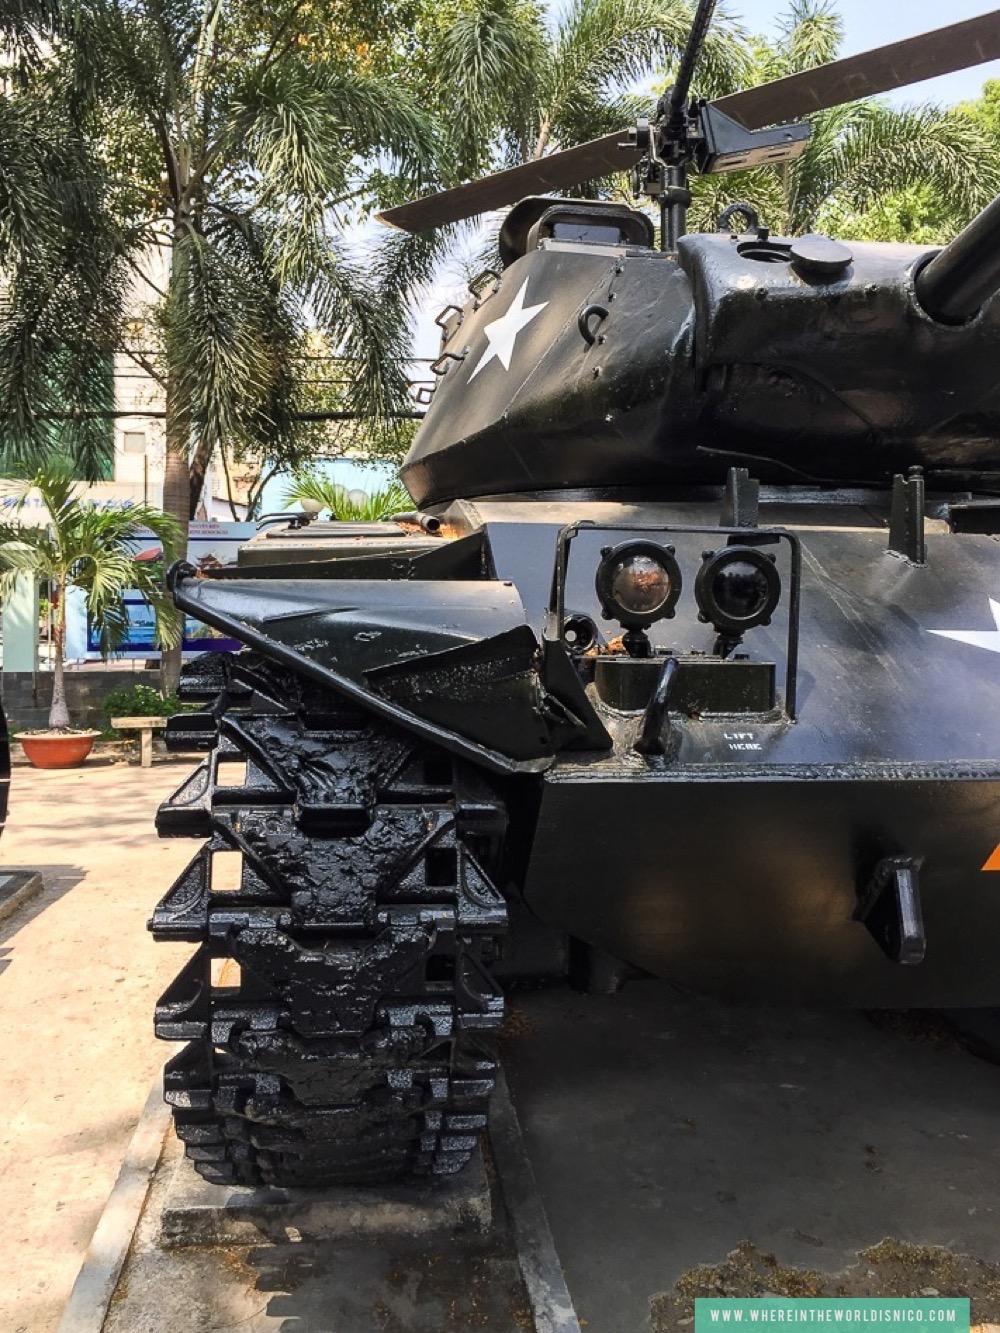 hcmc-vietnam-war-remnants-museum-tank.jpg